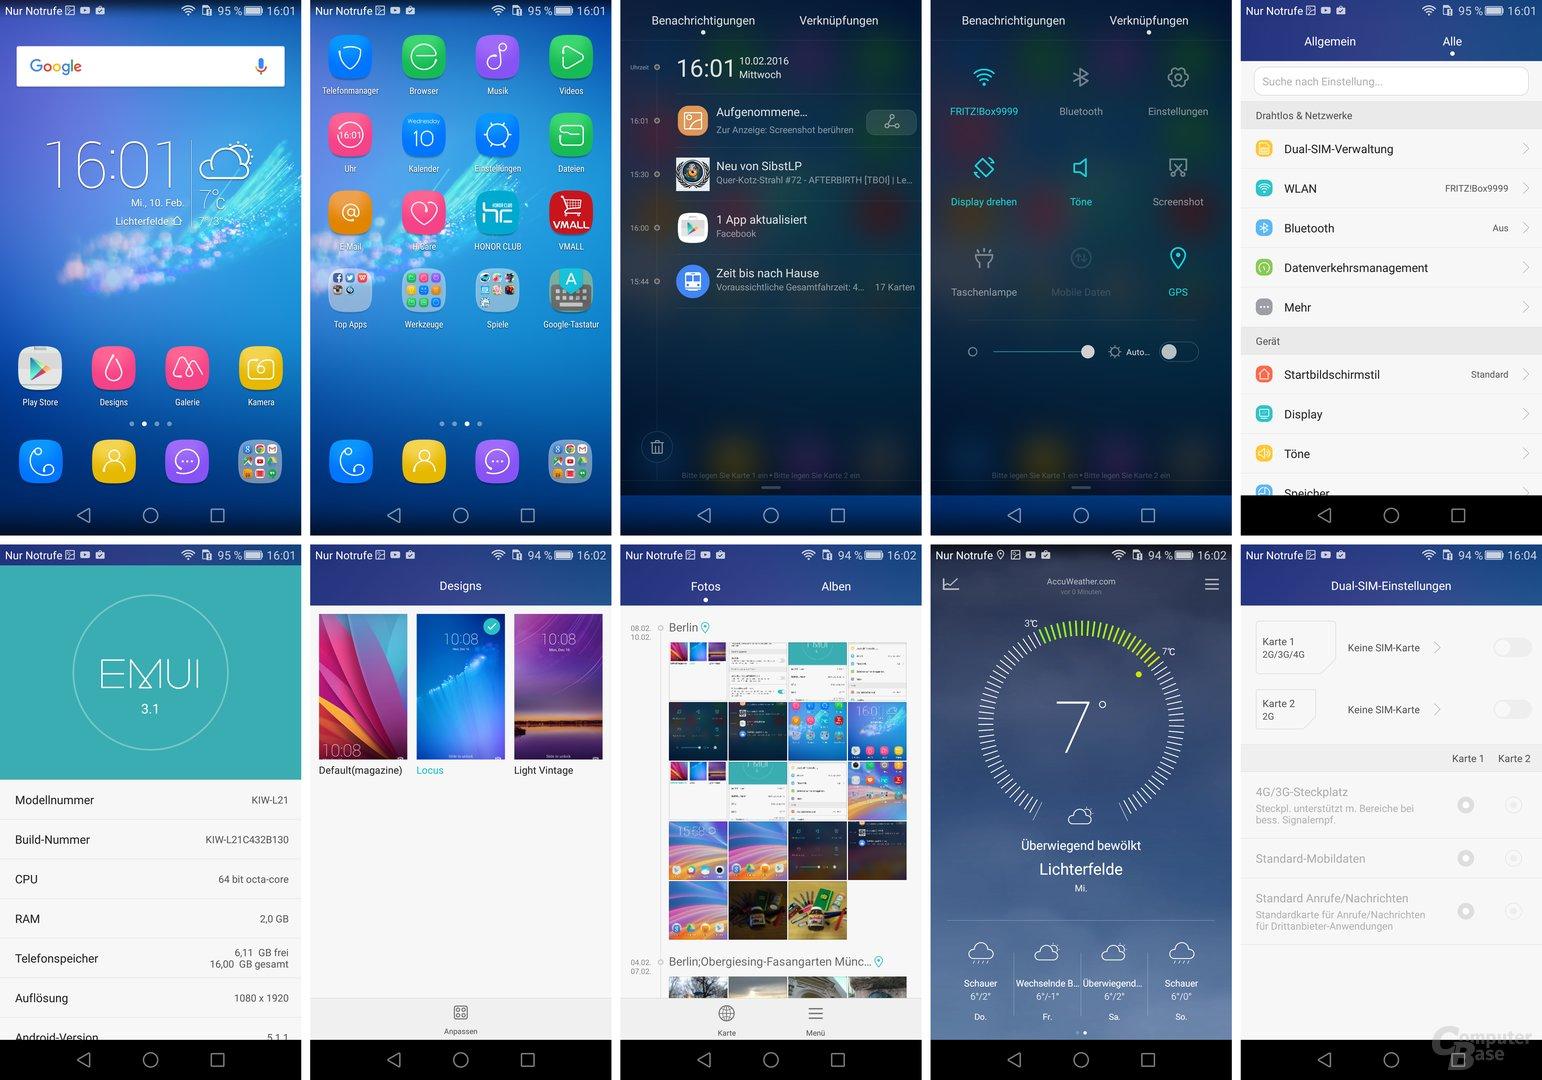 Android 5.1.1 mit Emotion UI 3.1